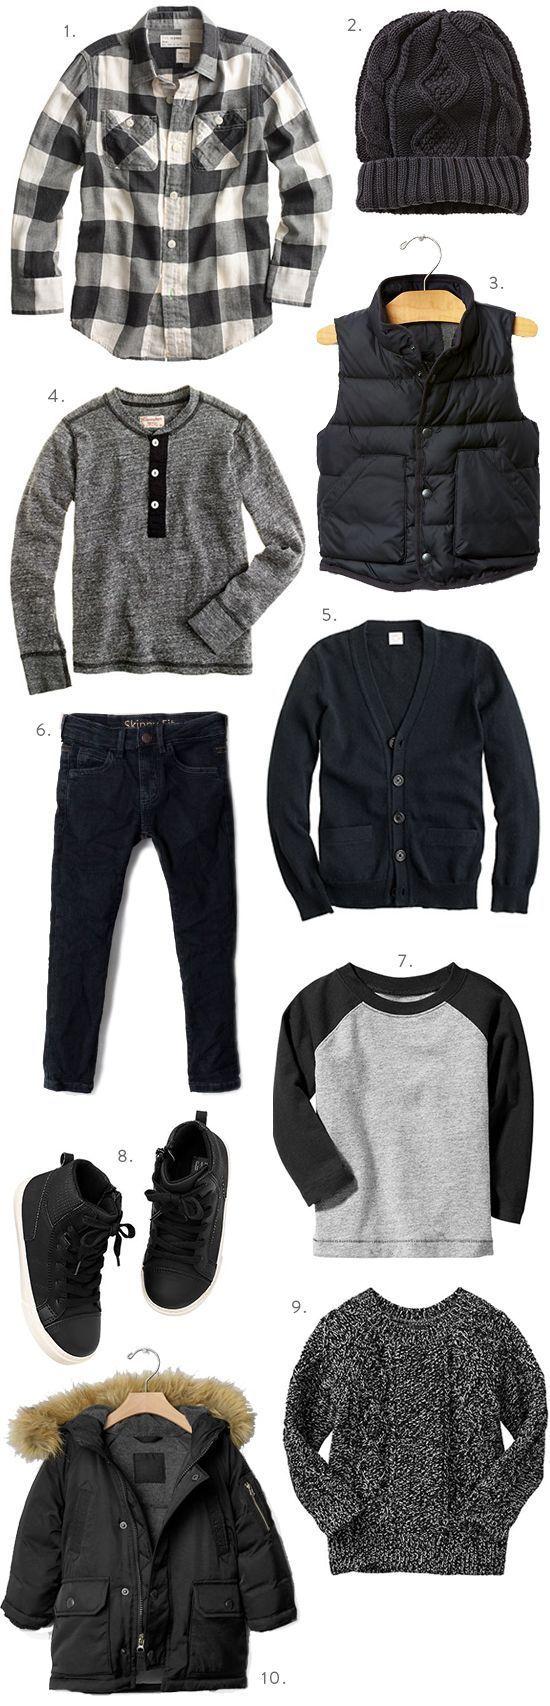 cool Boys Fall Fashion Black is Back | Sweet Little Peanut                                                                                                                                                                                 More